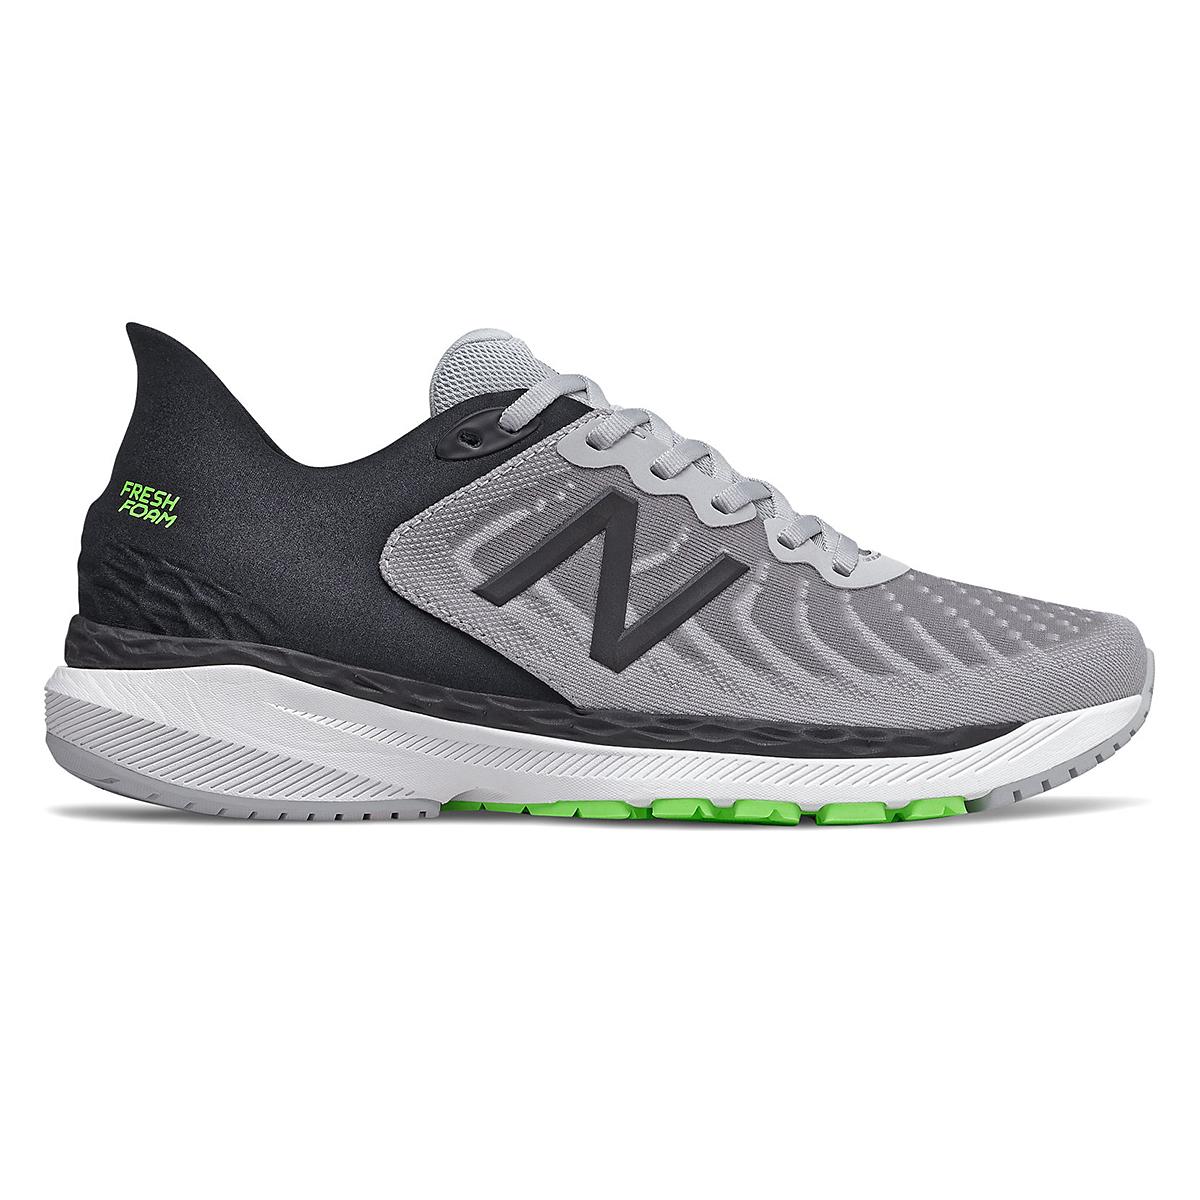 Men's New Balance 860V11 Running Shoe - Color: Light Aluminum/Black - Size: 6 - Width: Wide, Light Aluminum/Black, large, image 1